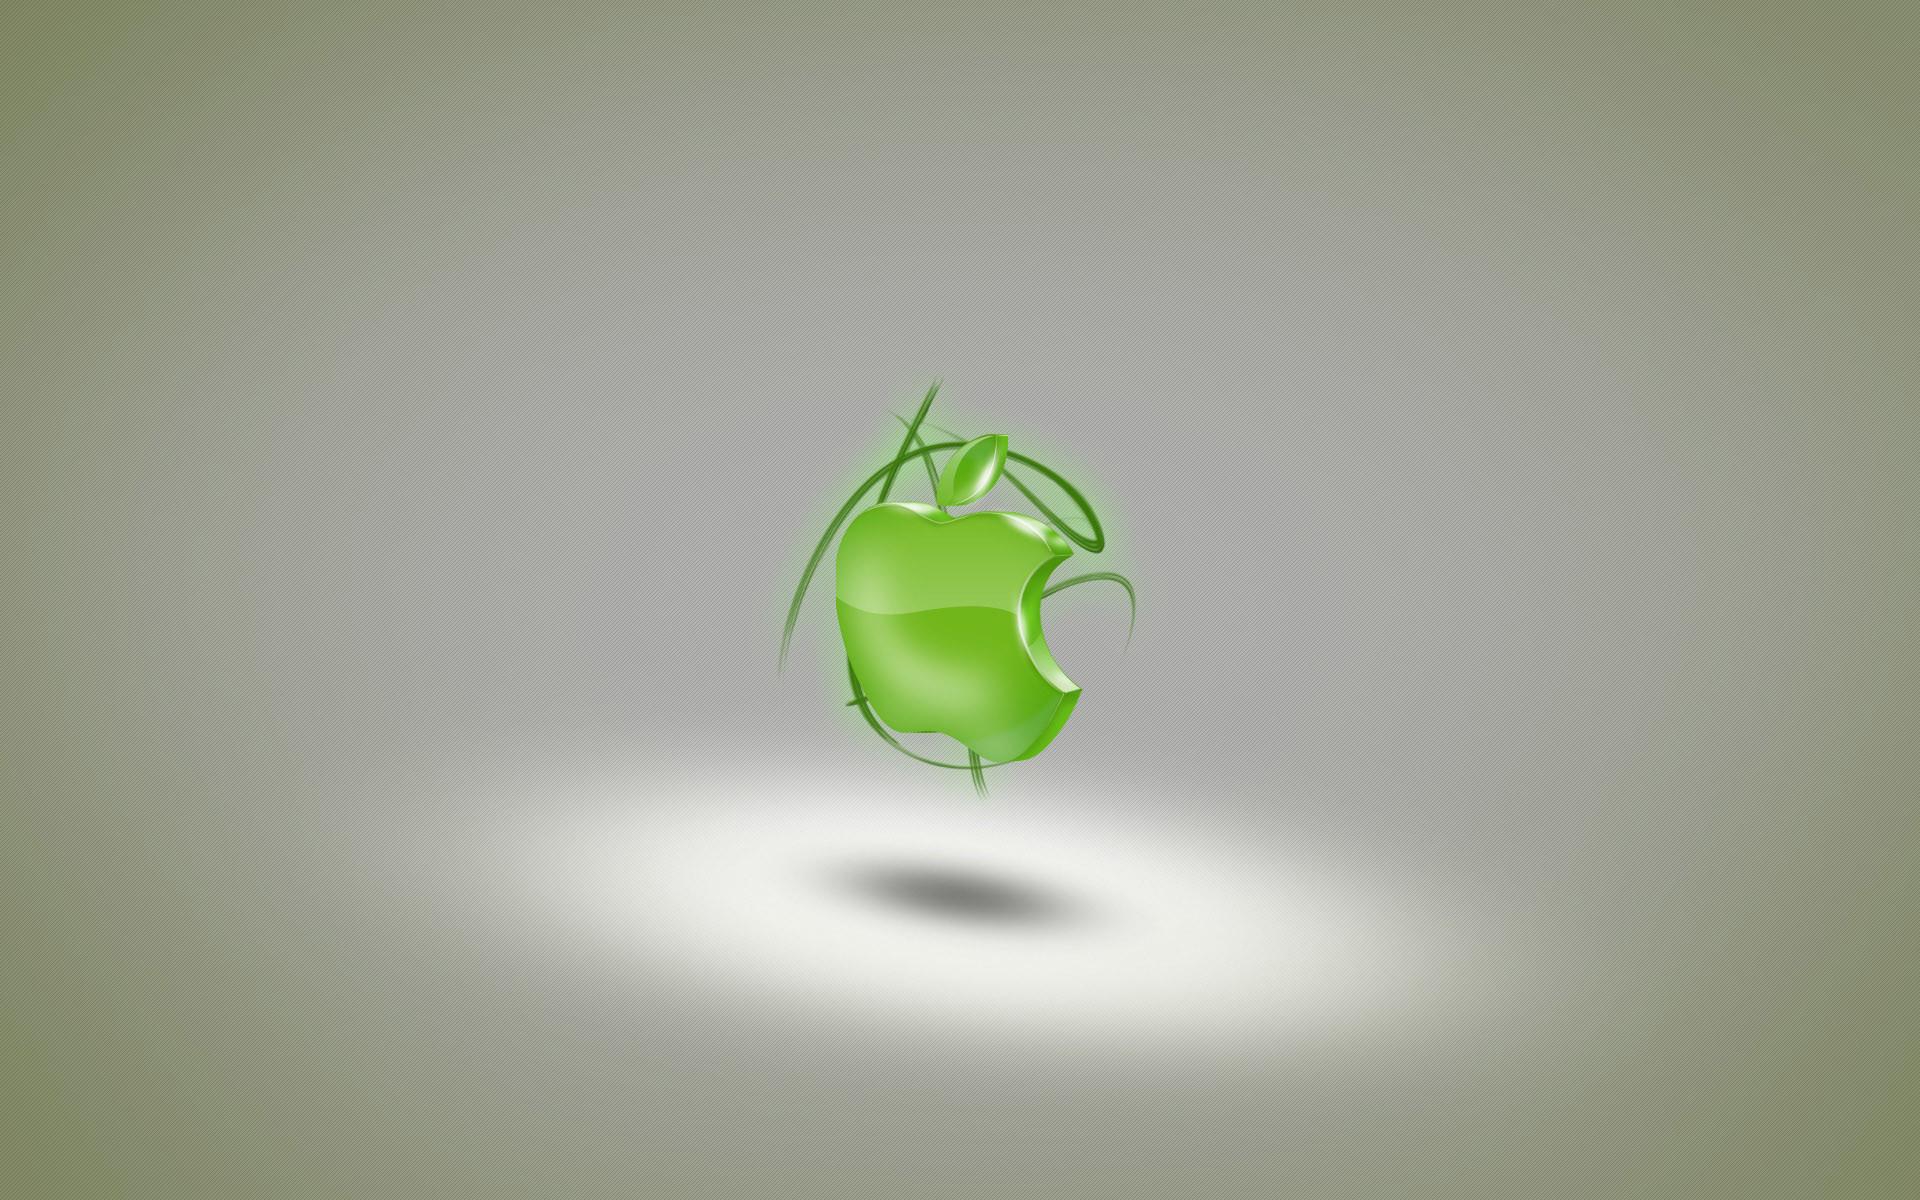 Ovo wallpaper mac apple – importance of non-aligned movement wallpaper  background